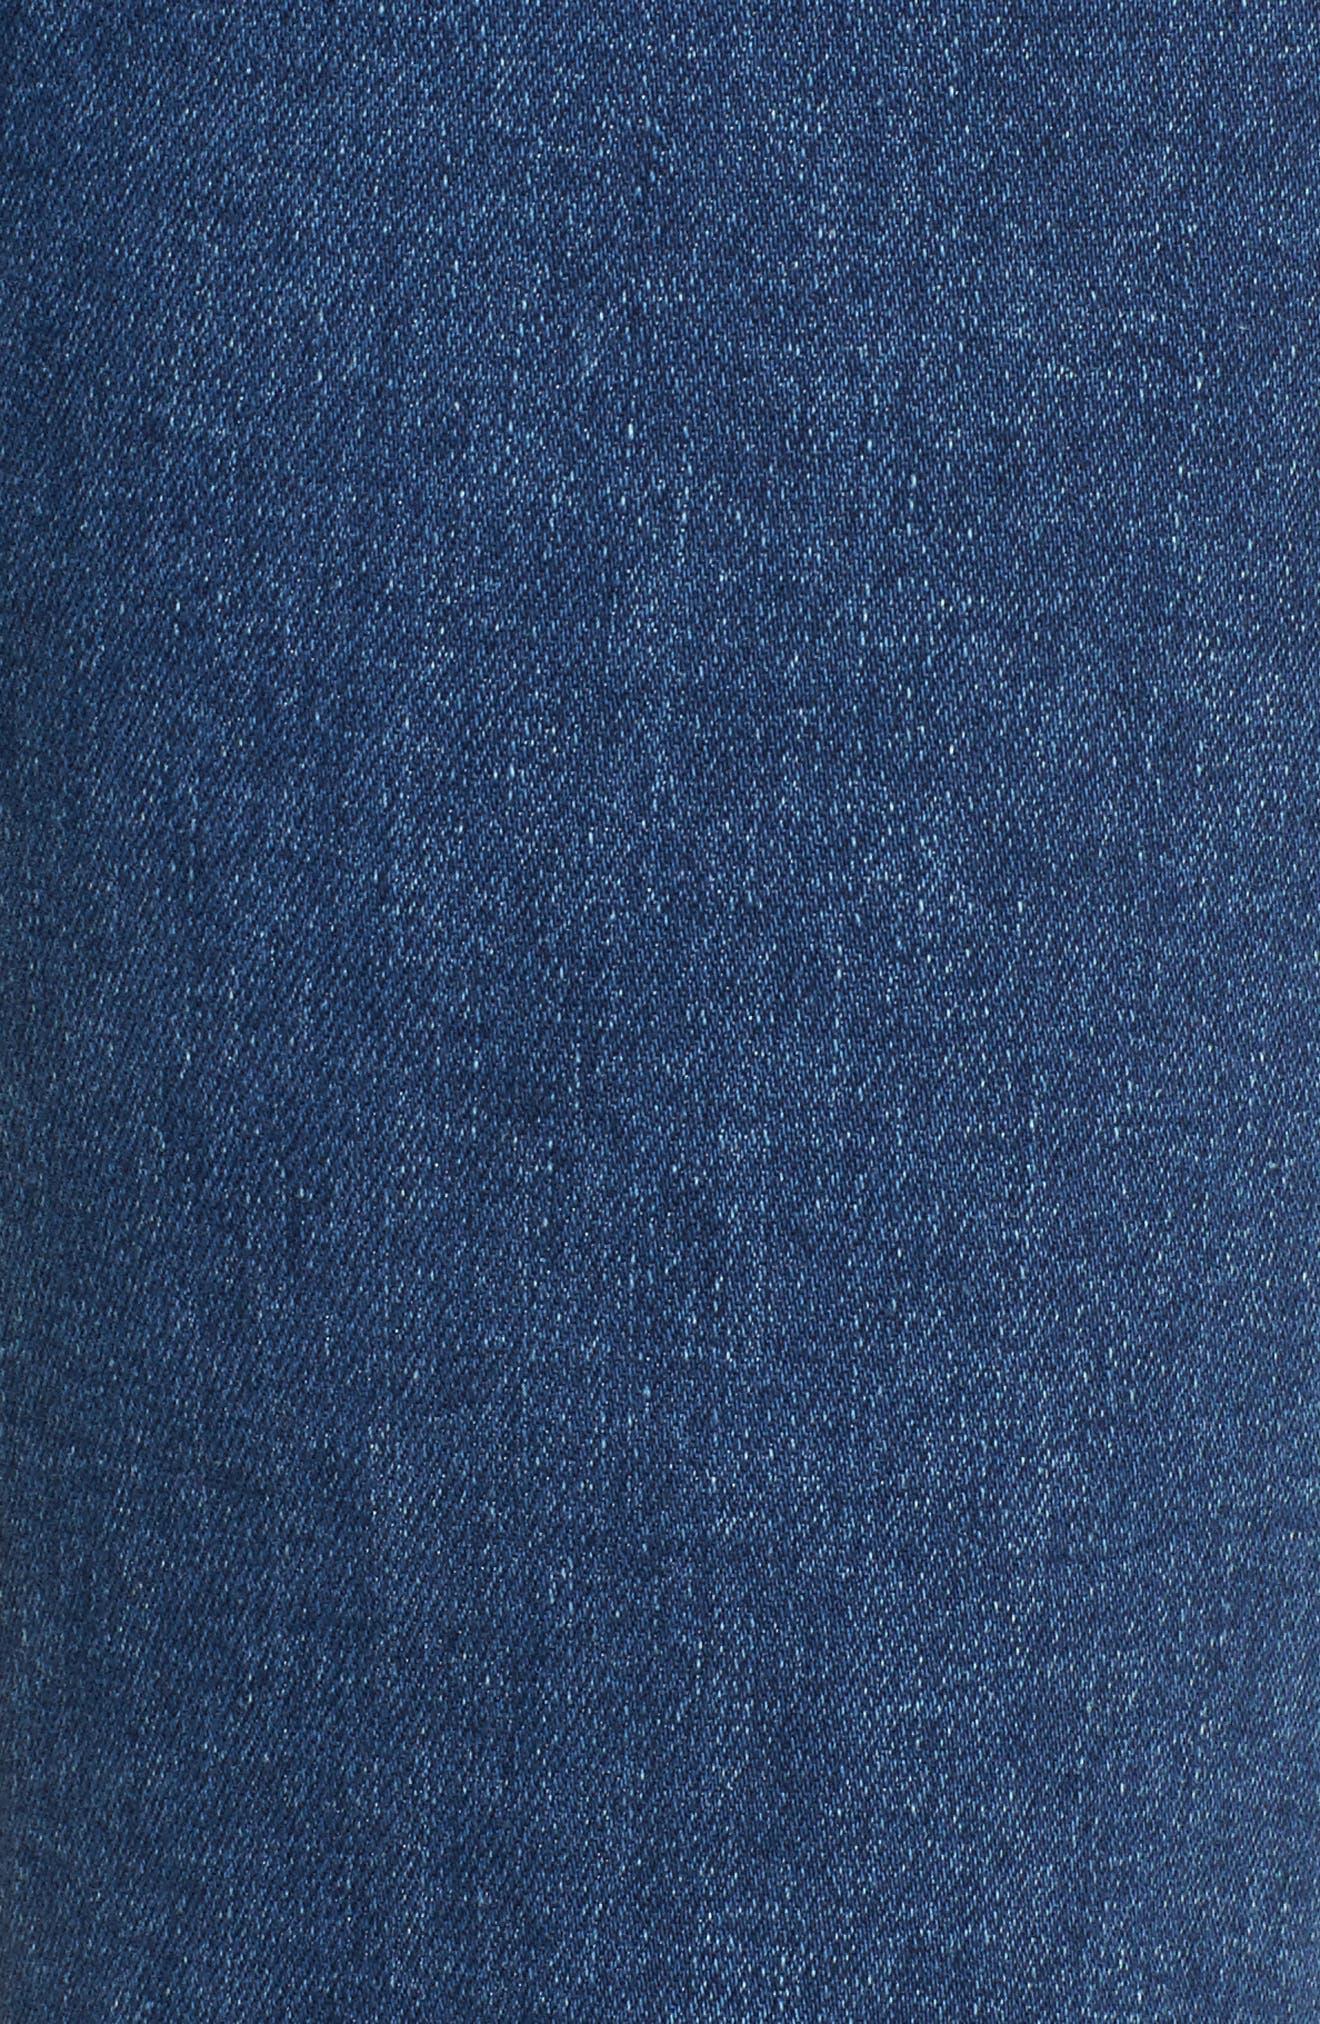 Alternate Image 5  - Jen7 Pearl Embellished Straight Cropped Jeans